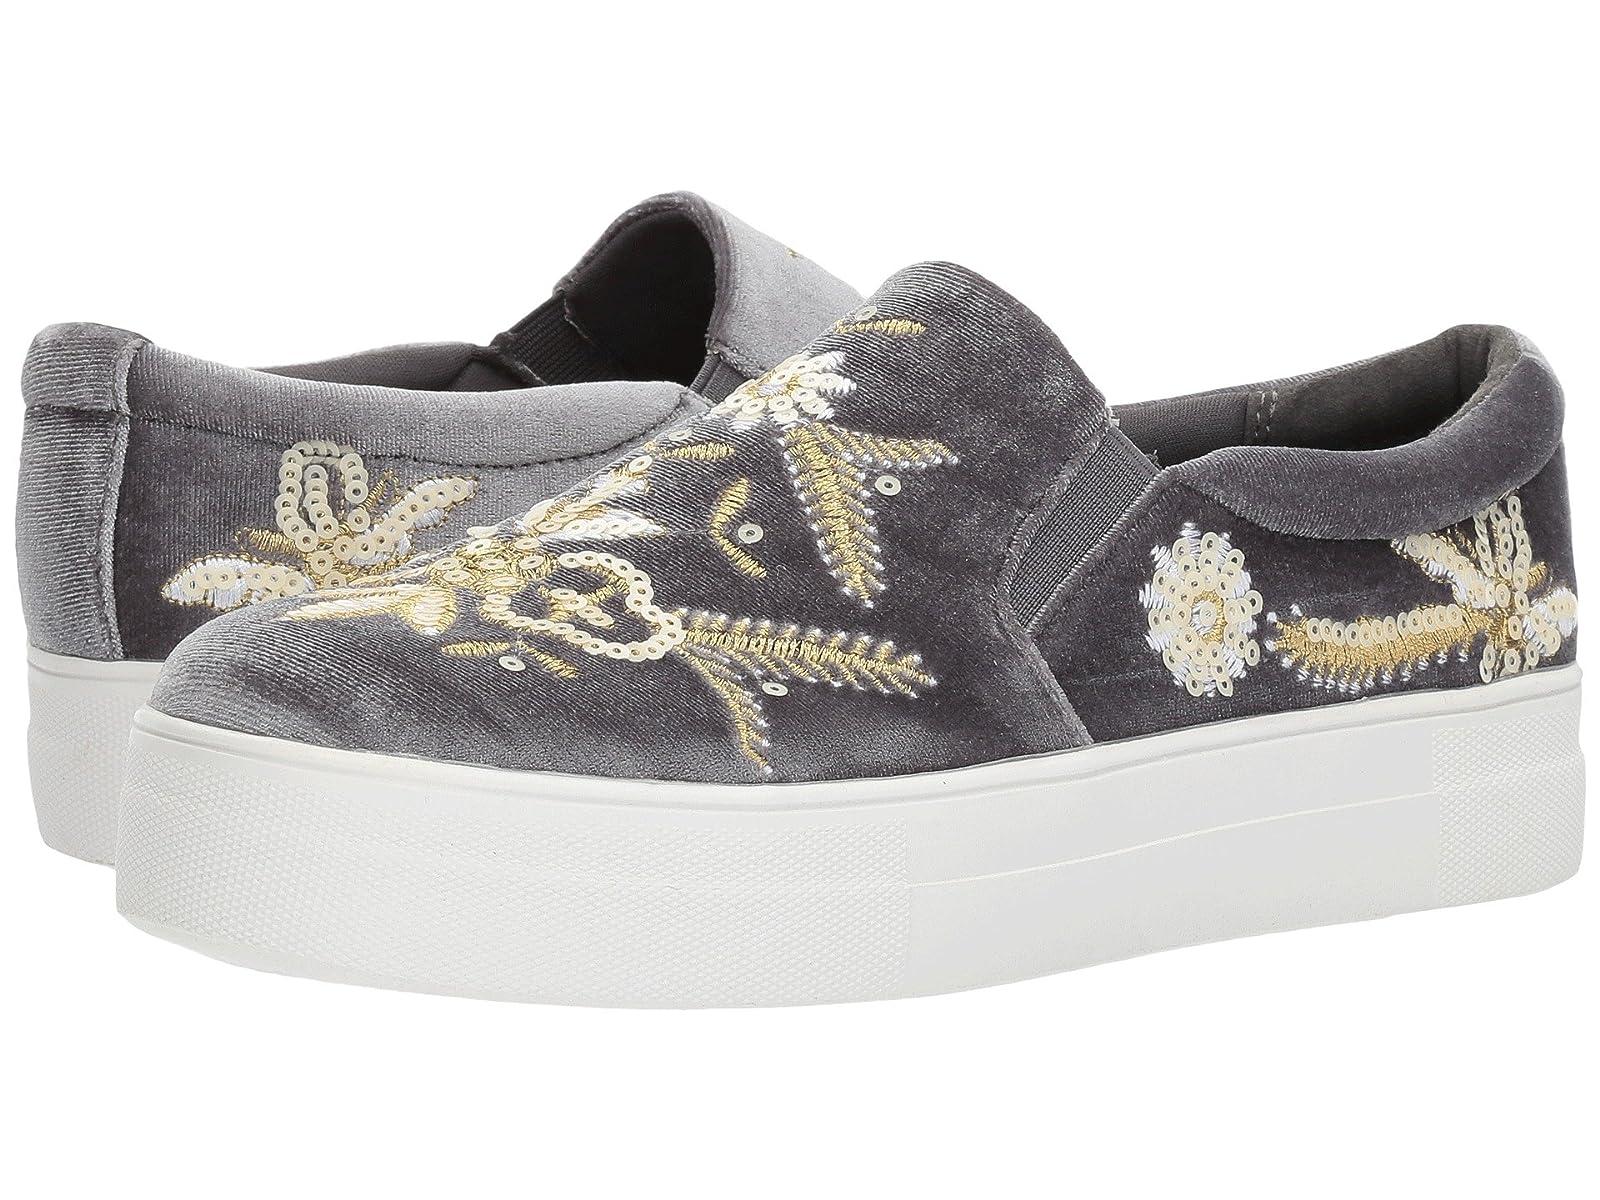 CARLOS by Carlos Santana AveryCheap and distinctive eye-catching shoes